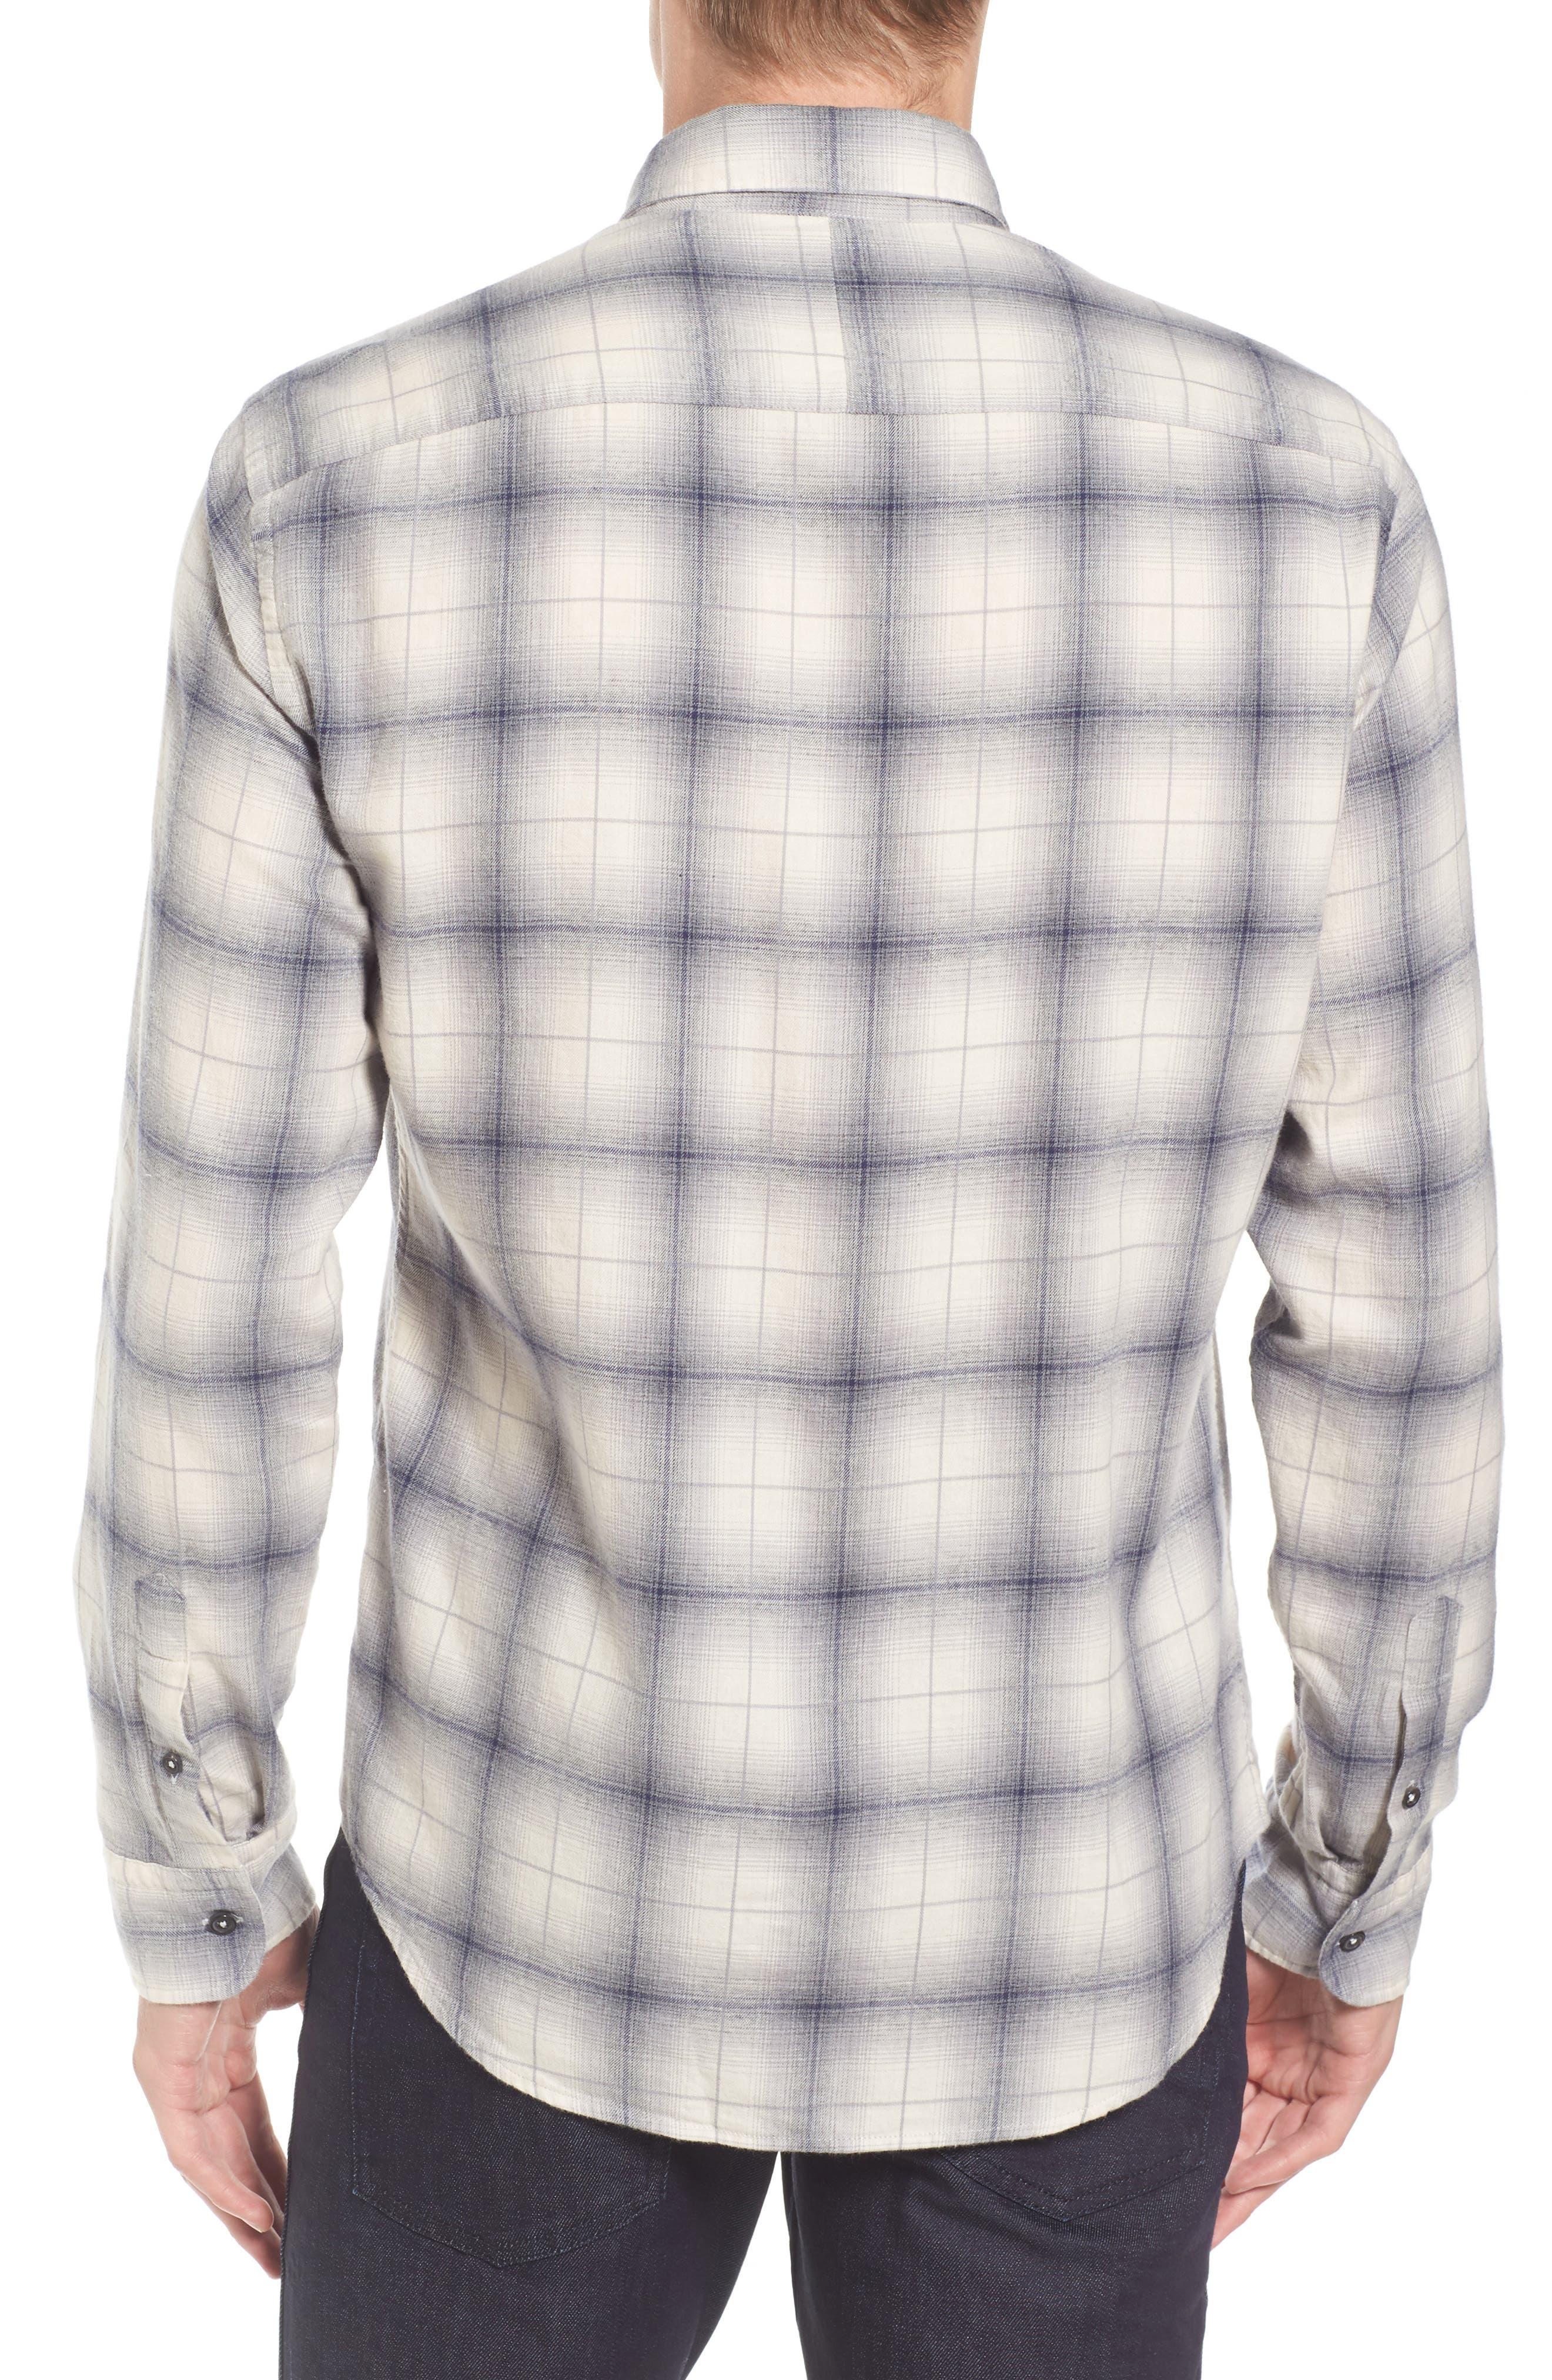 Kirby Slim Fit Plaid Flannel Shirt,                             Alternate thumbnail 2, color,                             Grey/ Blue